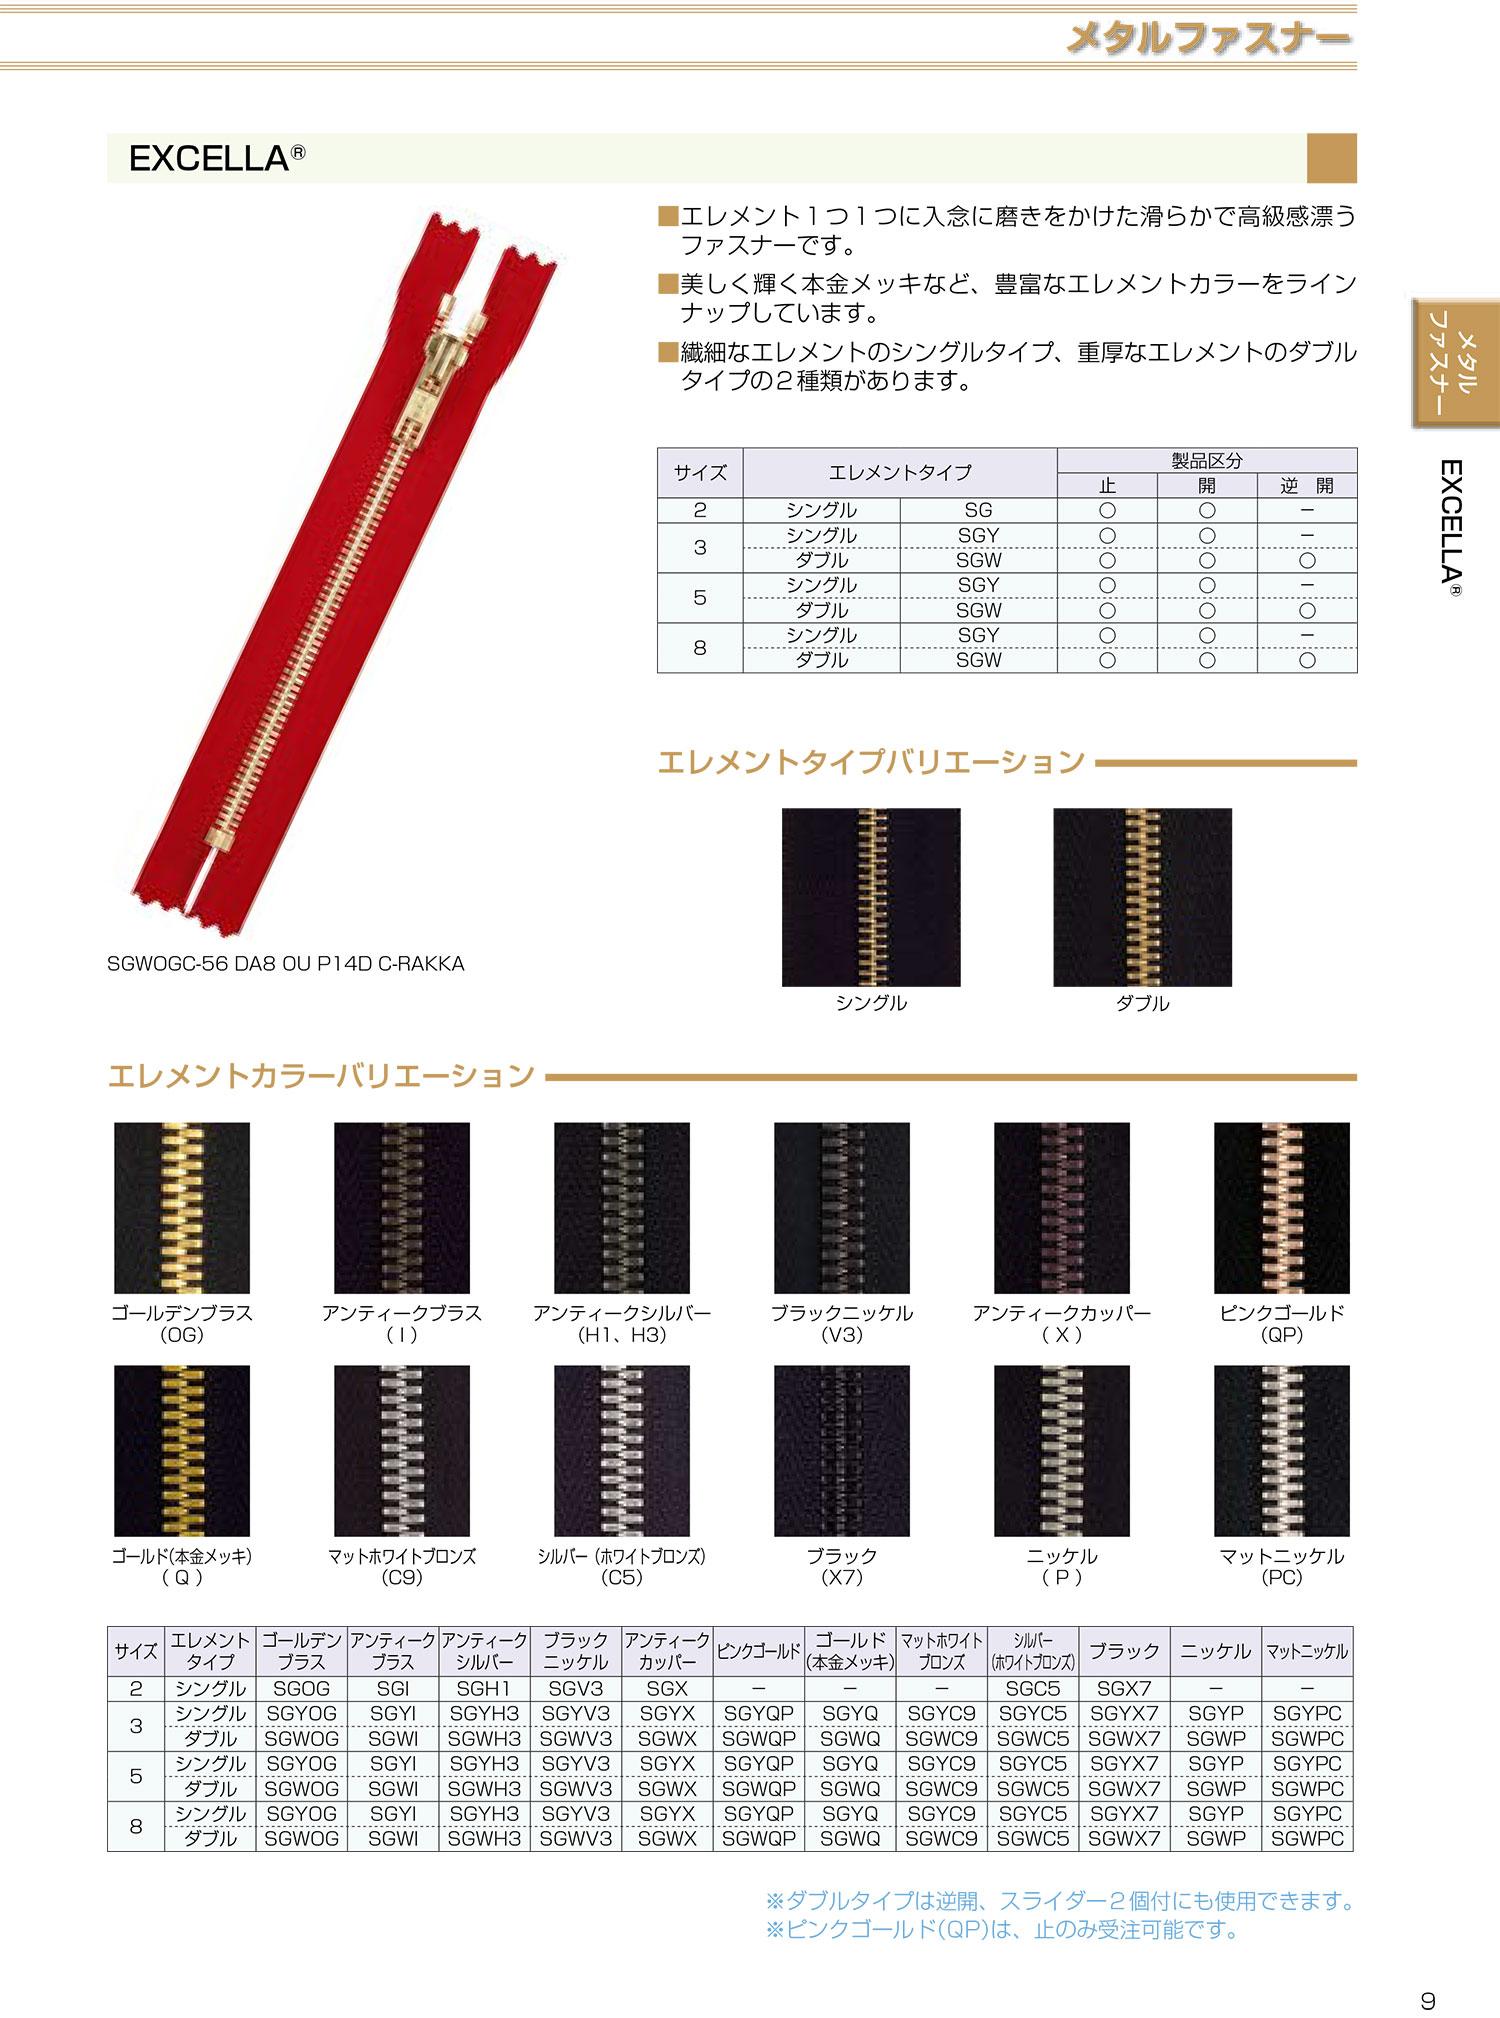 3SGWC9MR エクセラ 3サイズ マットホワイトブロンズ 逆開 ダブル[ファスナー] YKK/オークラ商事 - ApparelX アパレル資材卸通販